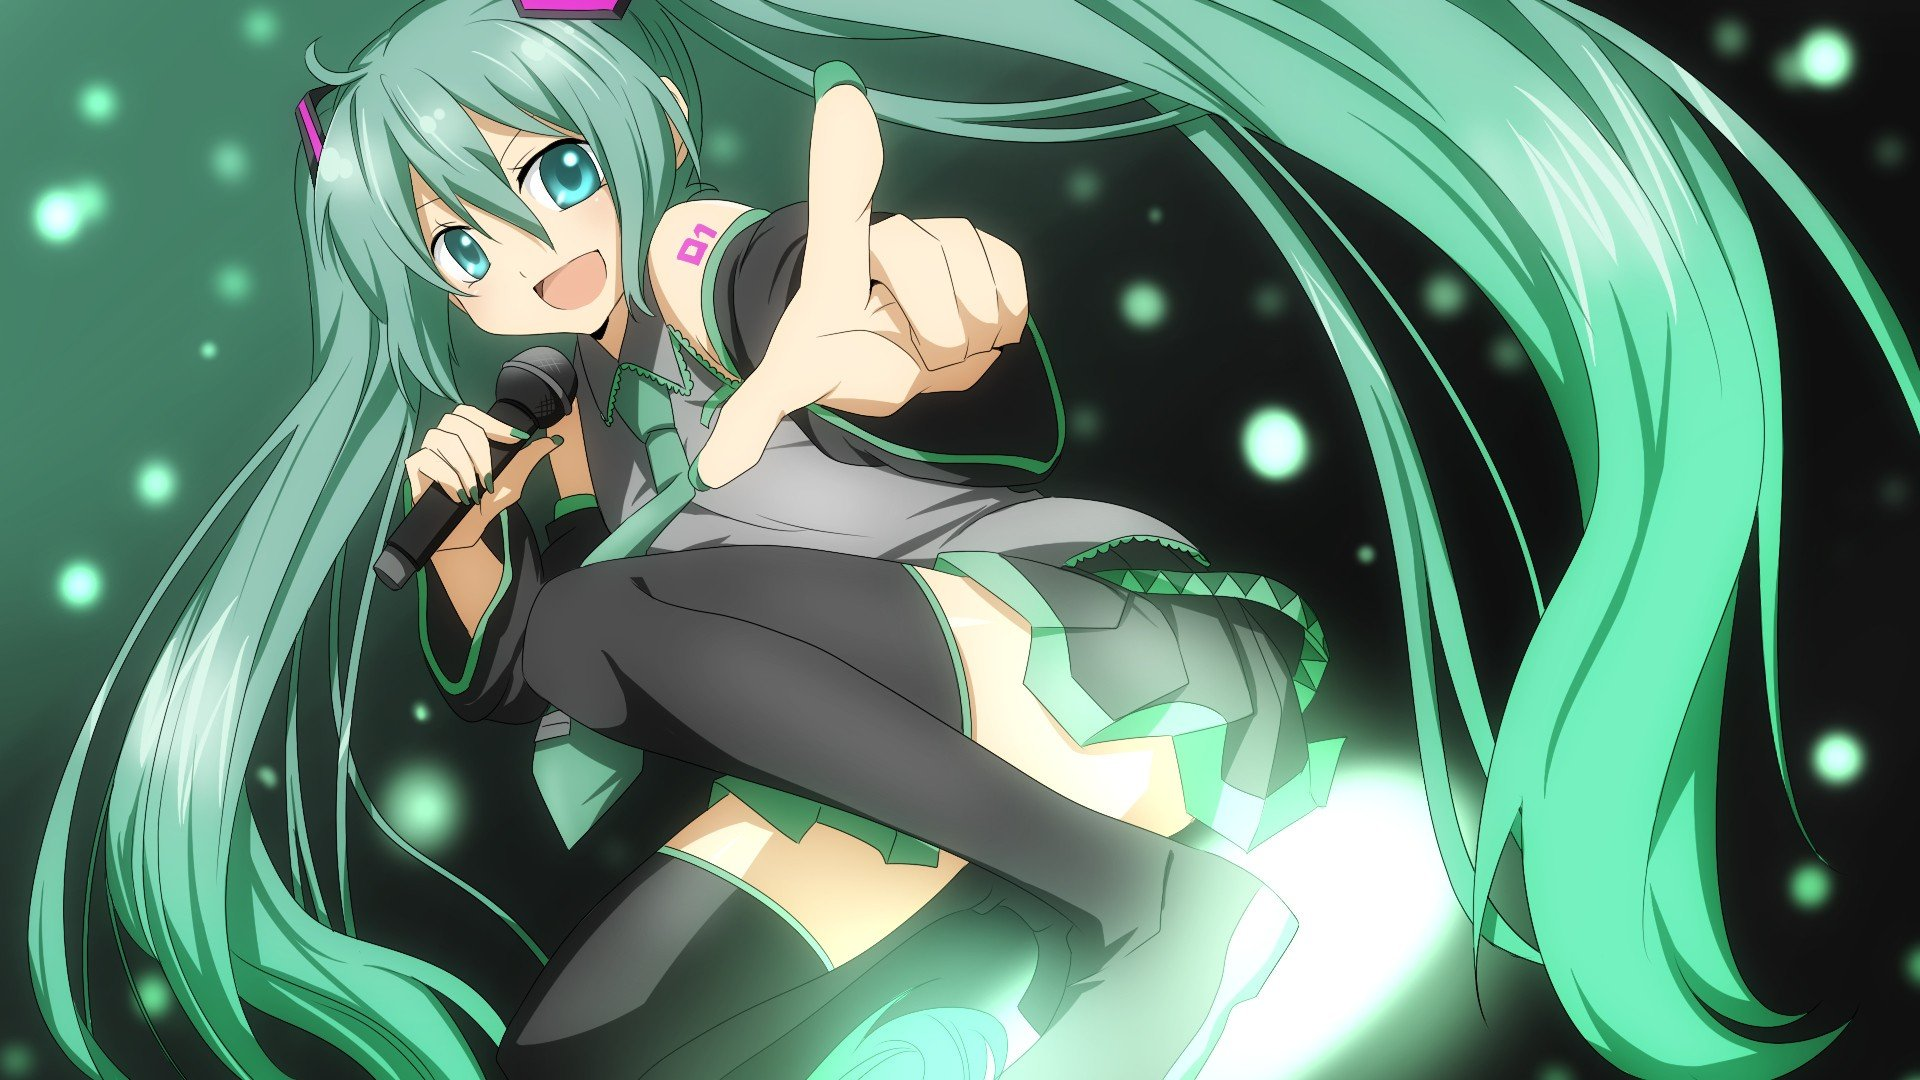 Neko Jacket Anime Wallpaper Girl Tattoos Vocaloid Hatsune Miku Green Eyes Green Hair Anime